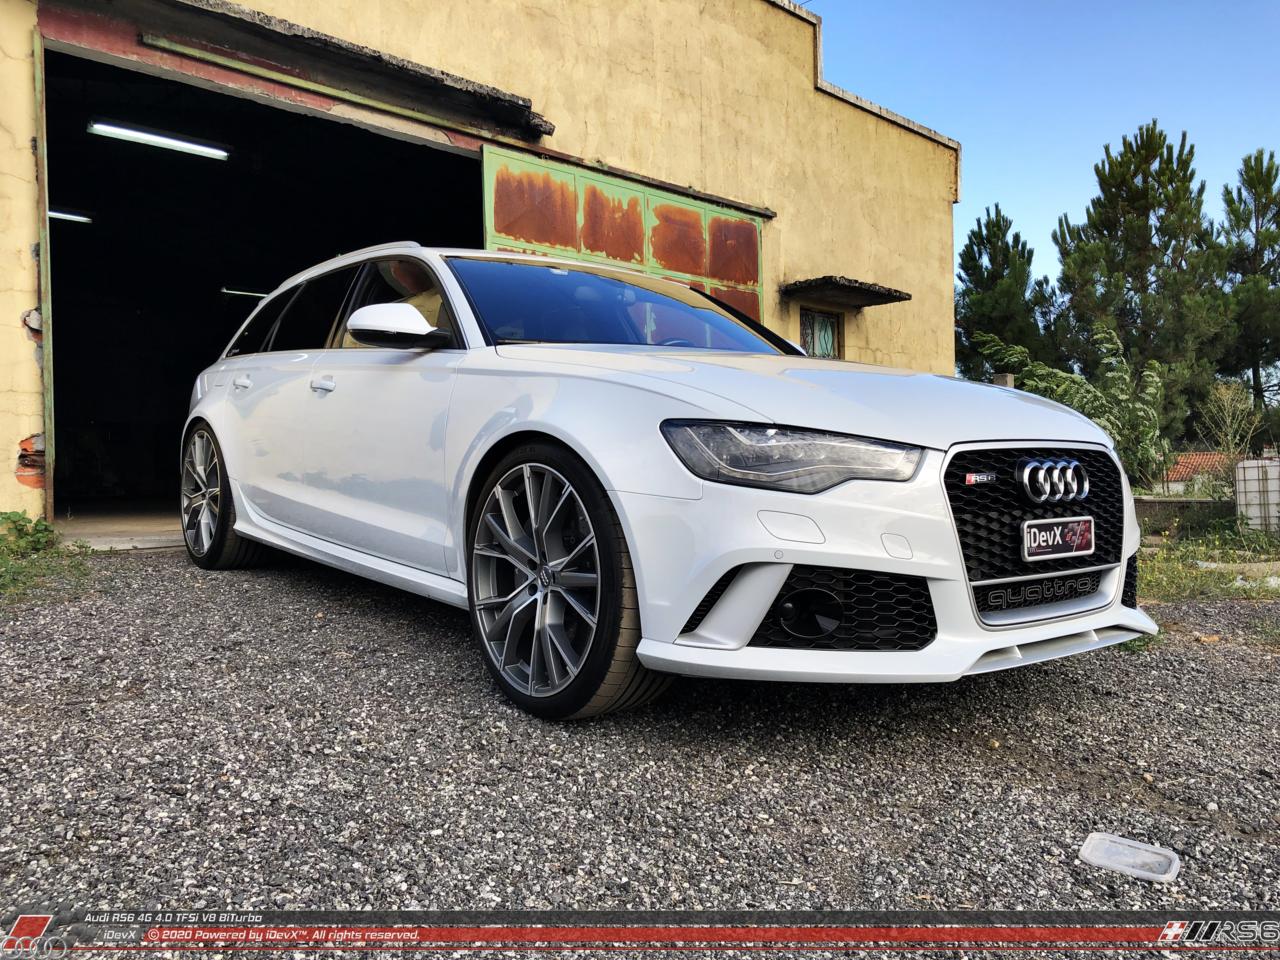 05_08.2019_Audi-RS6_iDevX_057.png